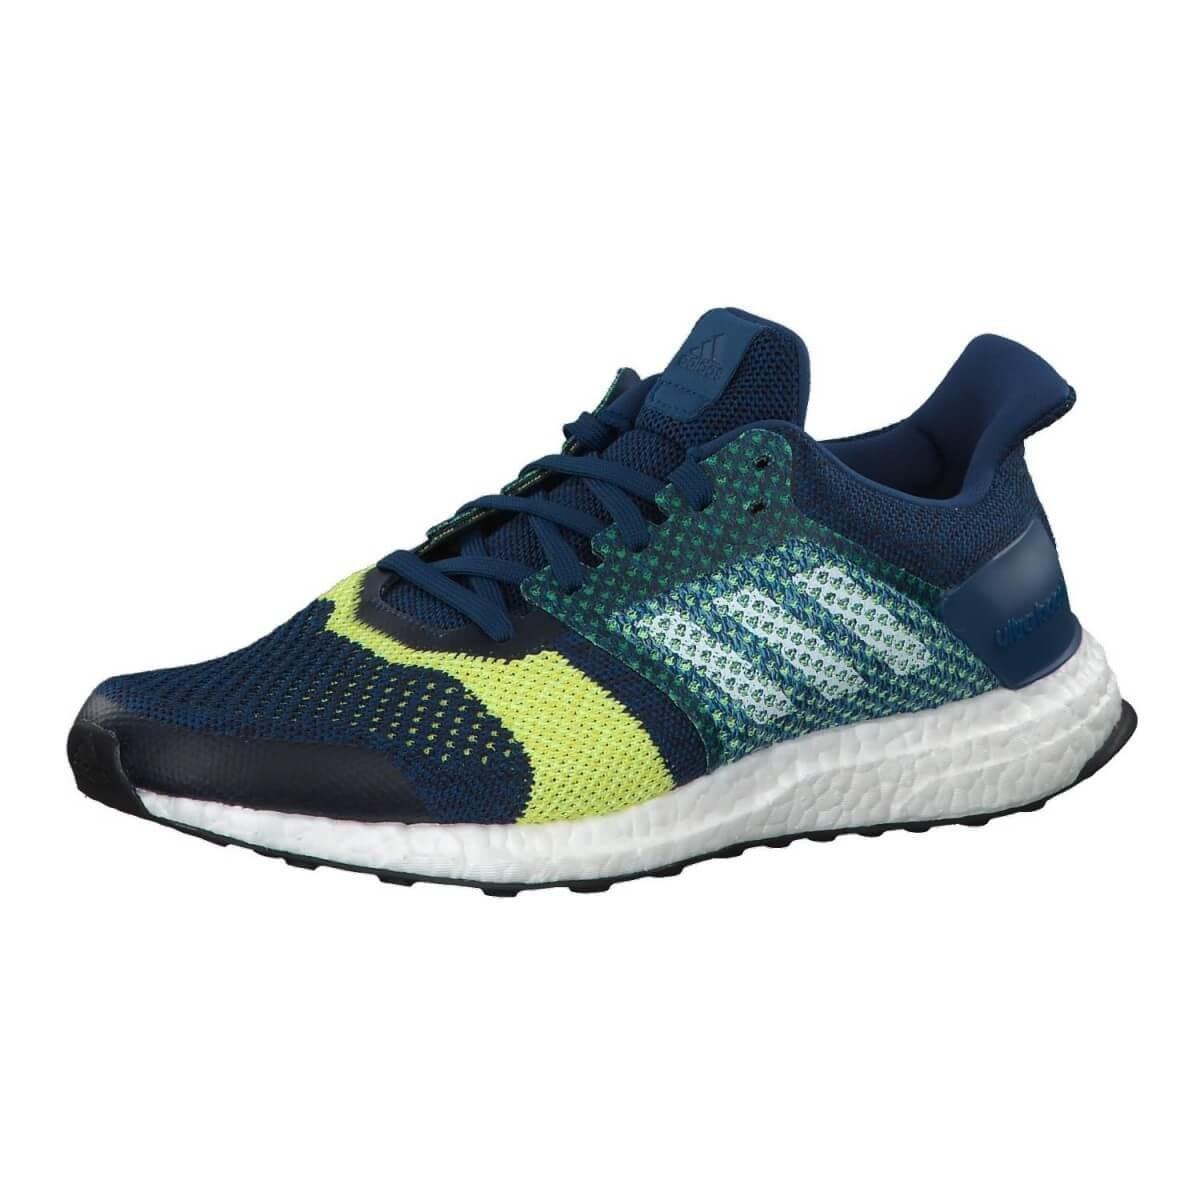 new products f7640 b7018 ... Zapatillas Adidas Ultra Boost ST Hombre Azul Amarillo Verde PV19 ...